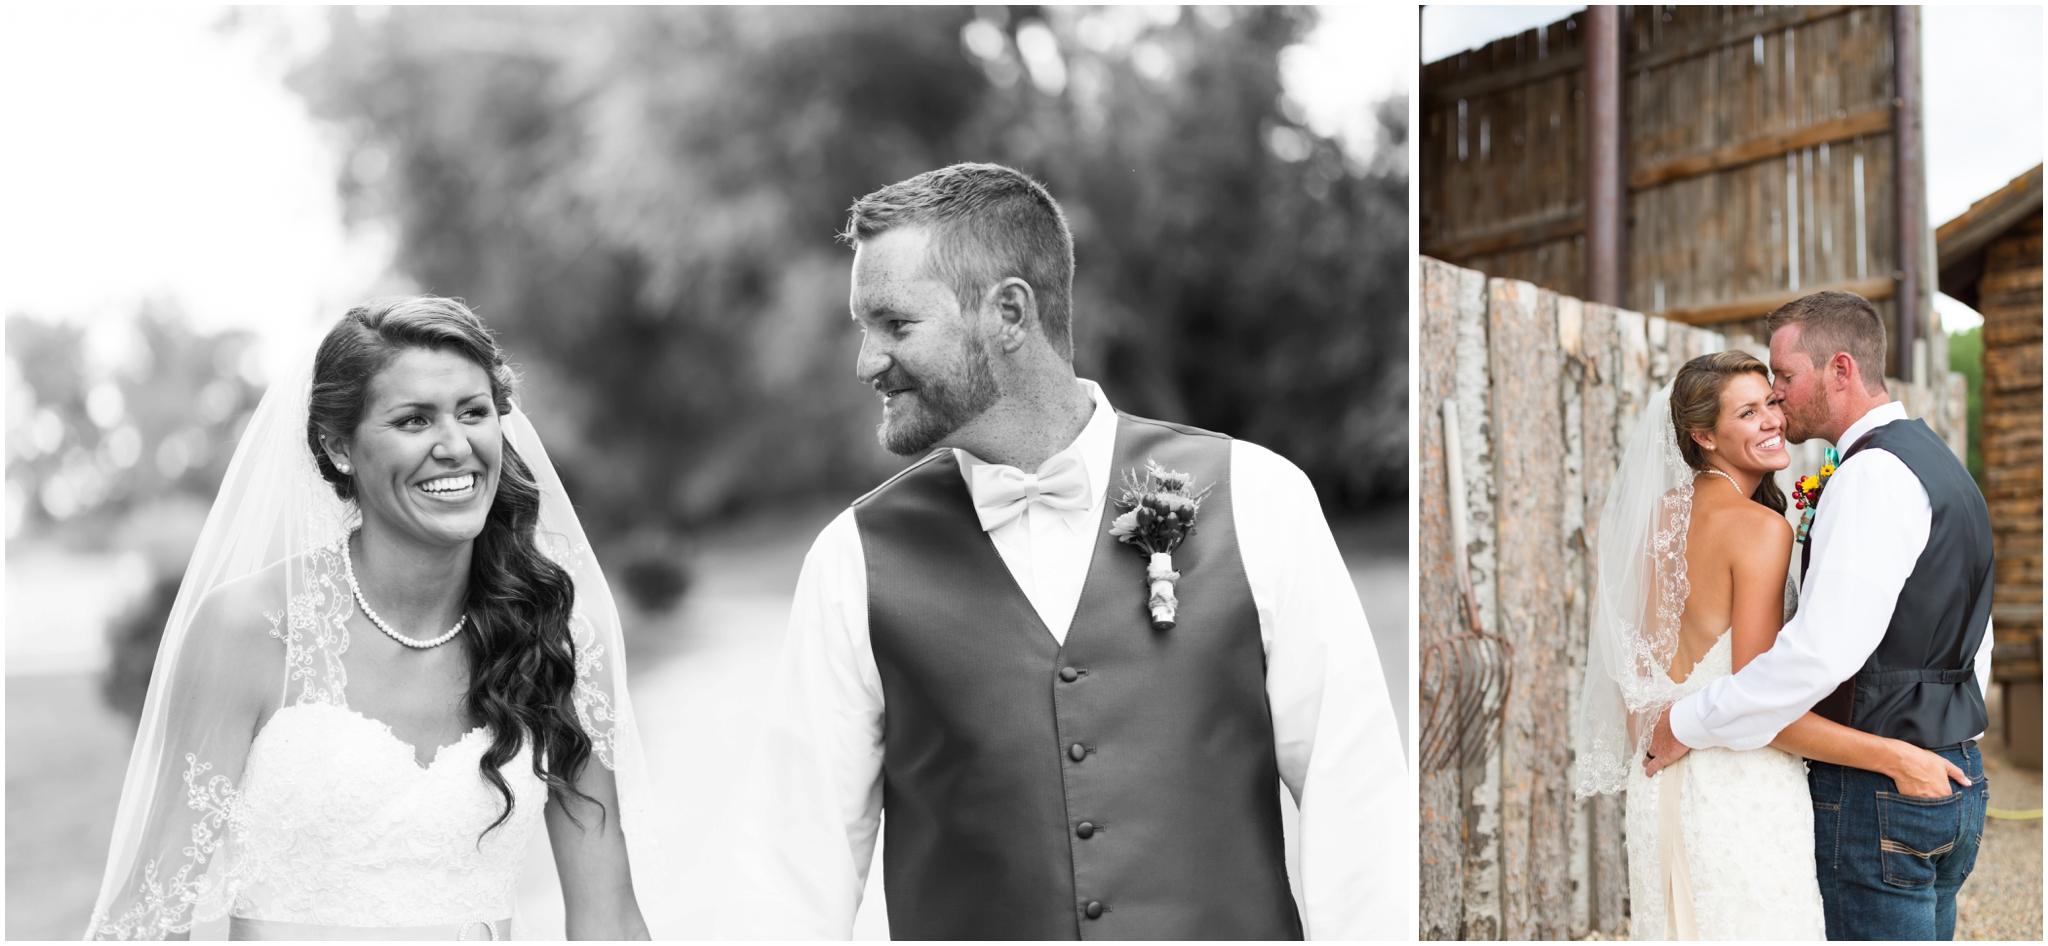 Sylvan Dale Ranch Wedding.jpg